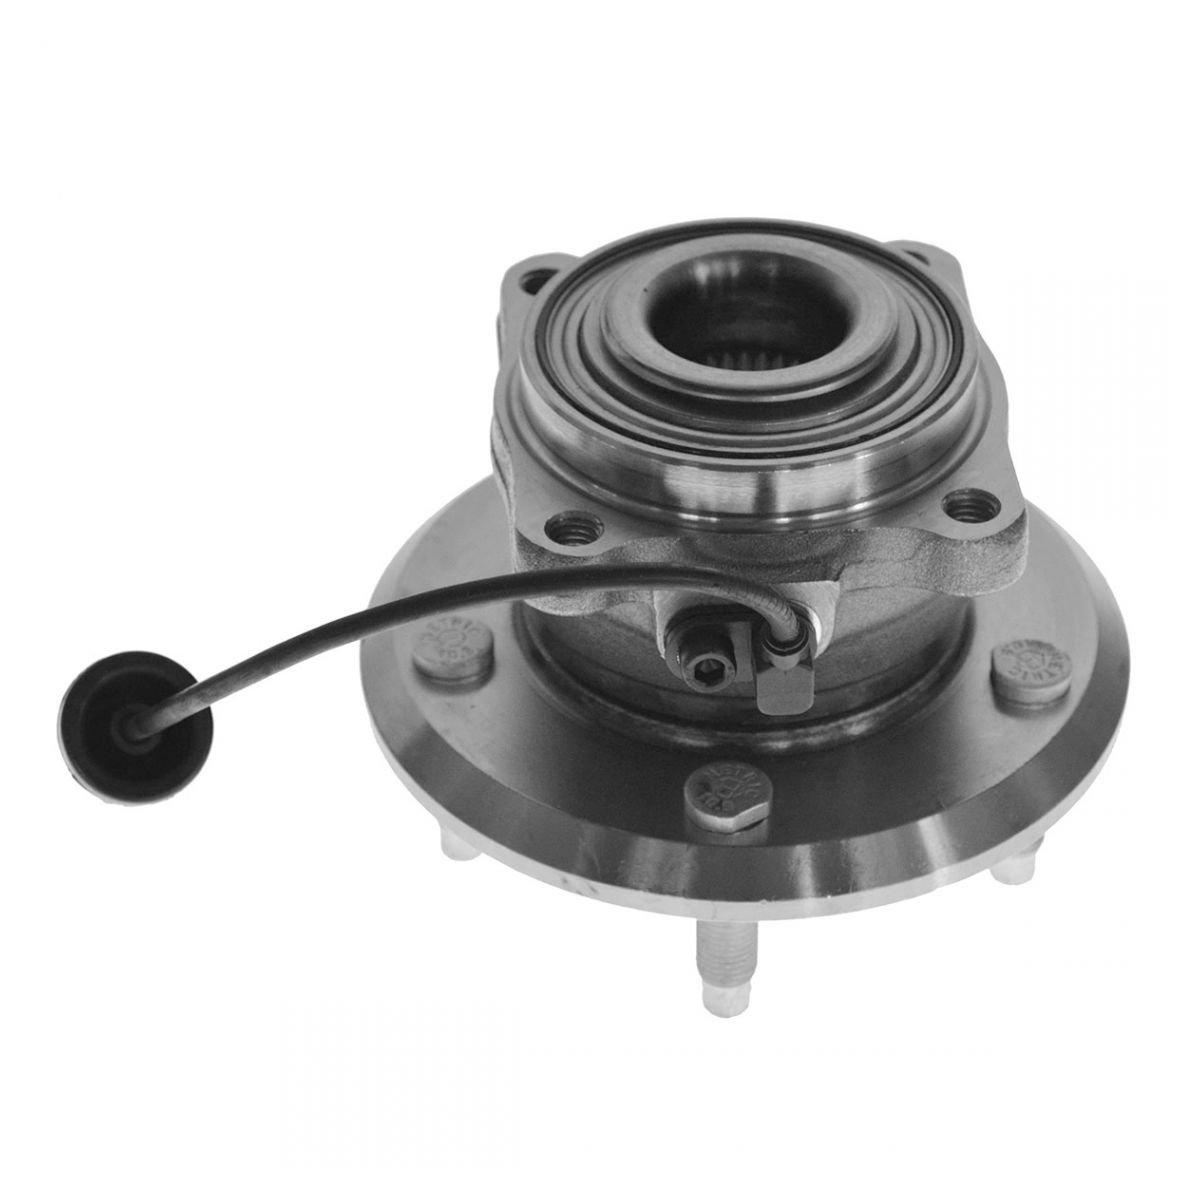 Rear Wheel Hub & Bearing 5 Lug ABS for Torrent Equinox Vue XL7 Hybrid SUV AM Autoparts